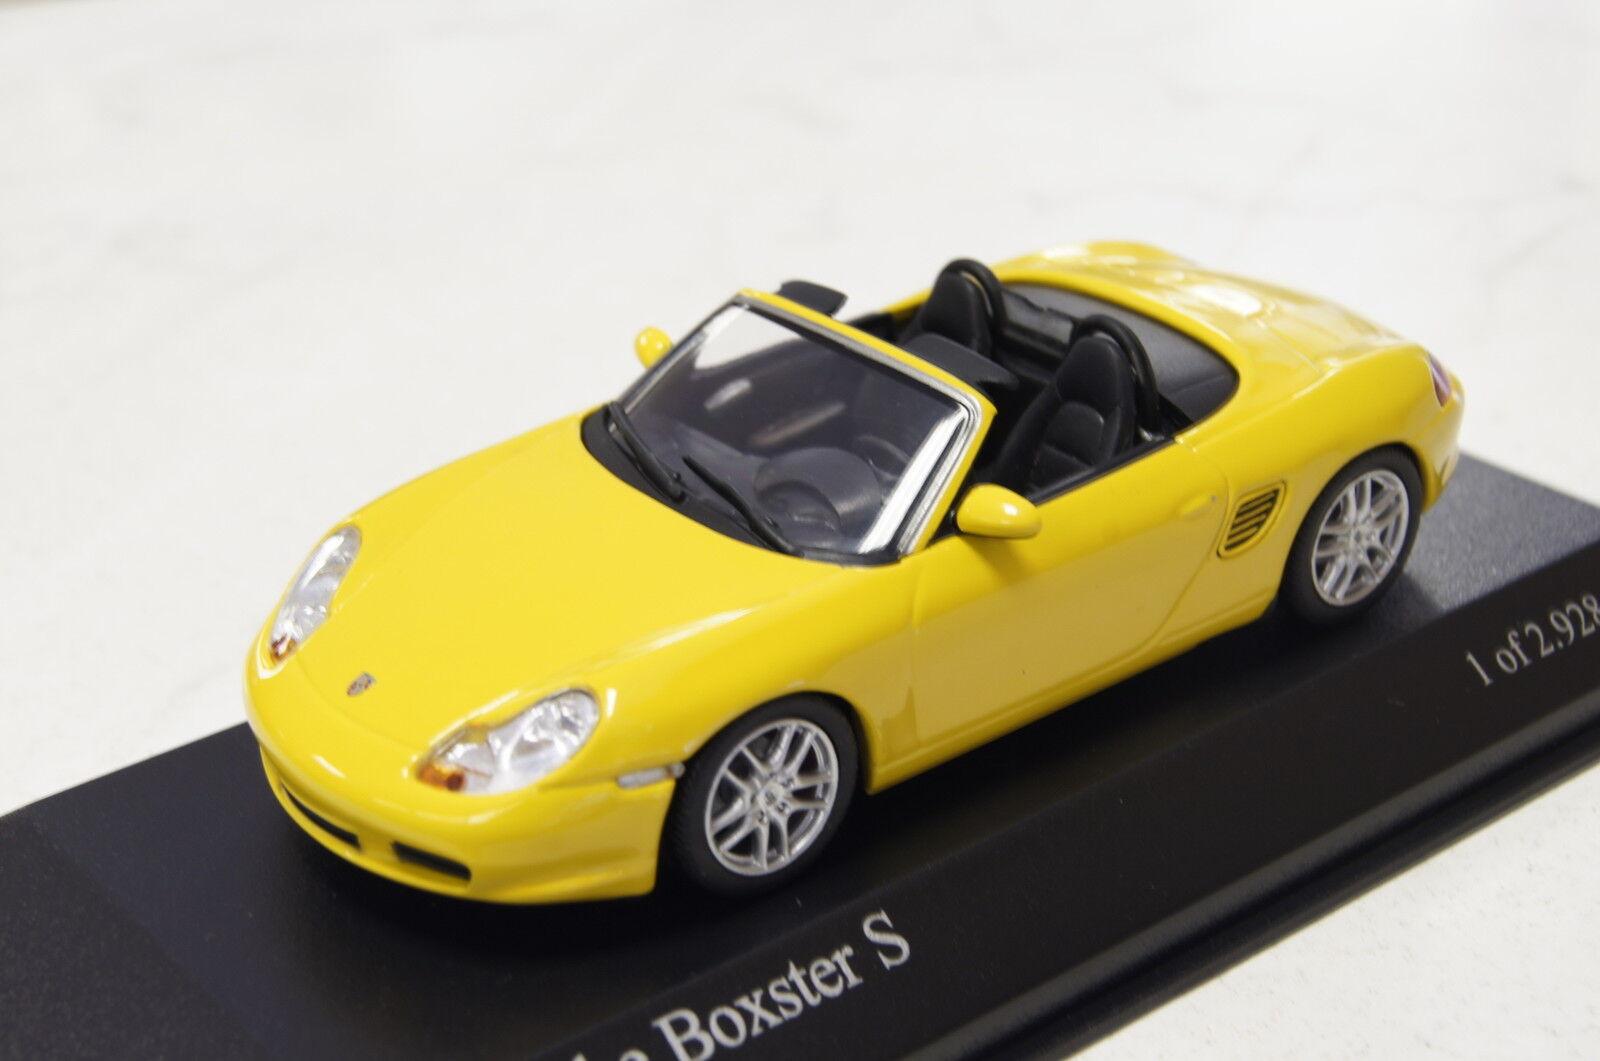 Porsche Boxster S 2002 gelb 1 43  Minichamps neu & OVP  | Günstige